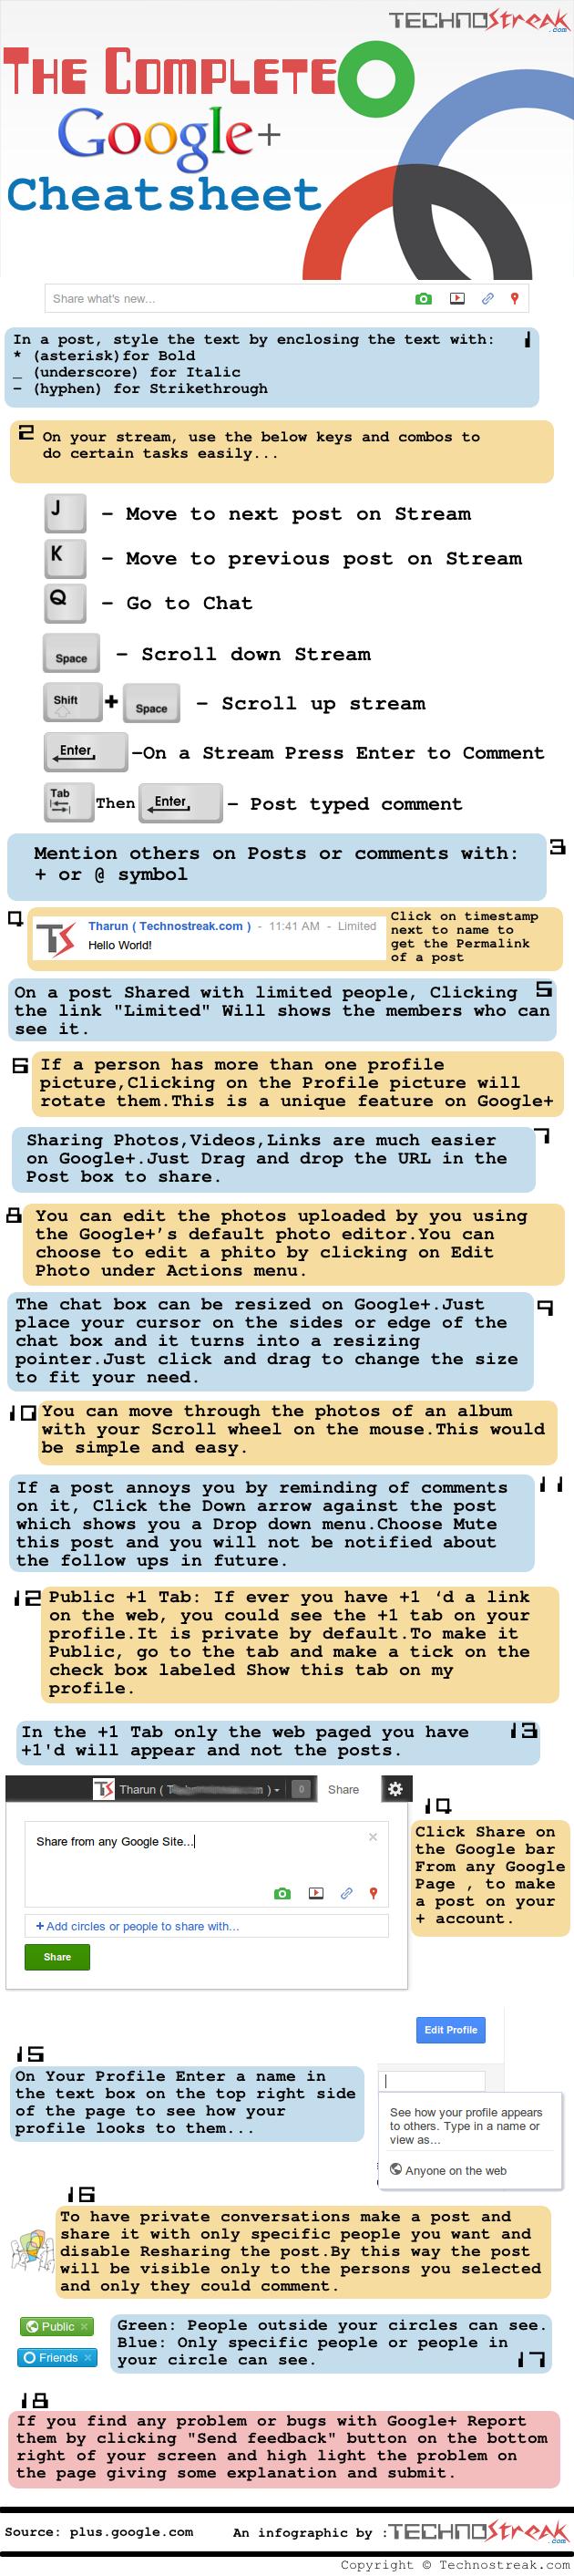 Google Plus Cheat Sheet